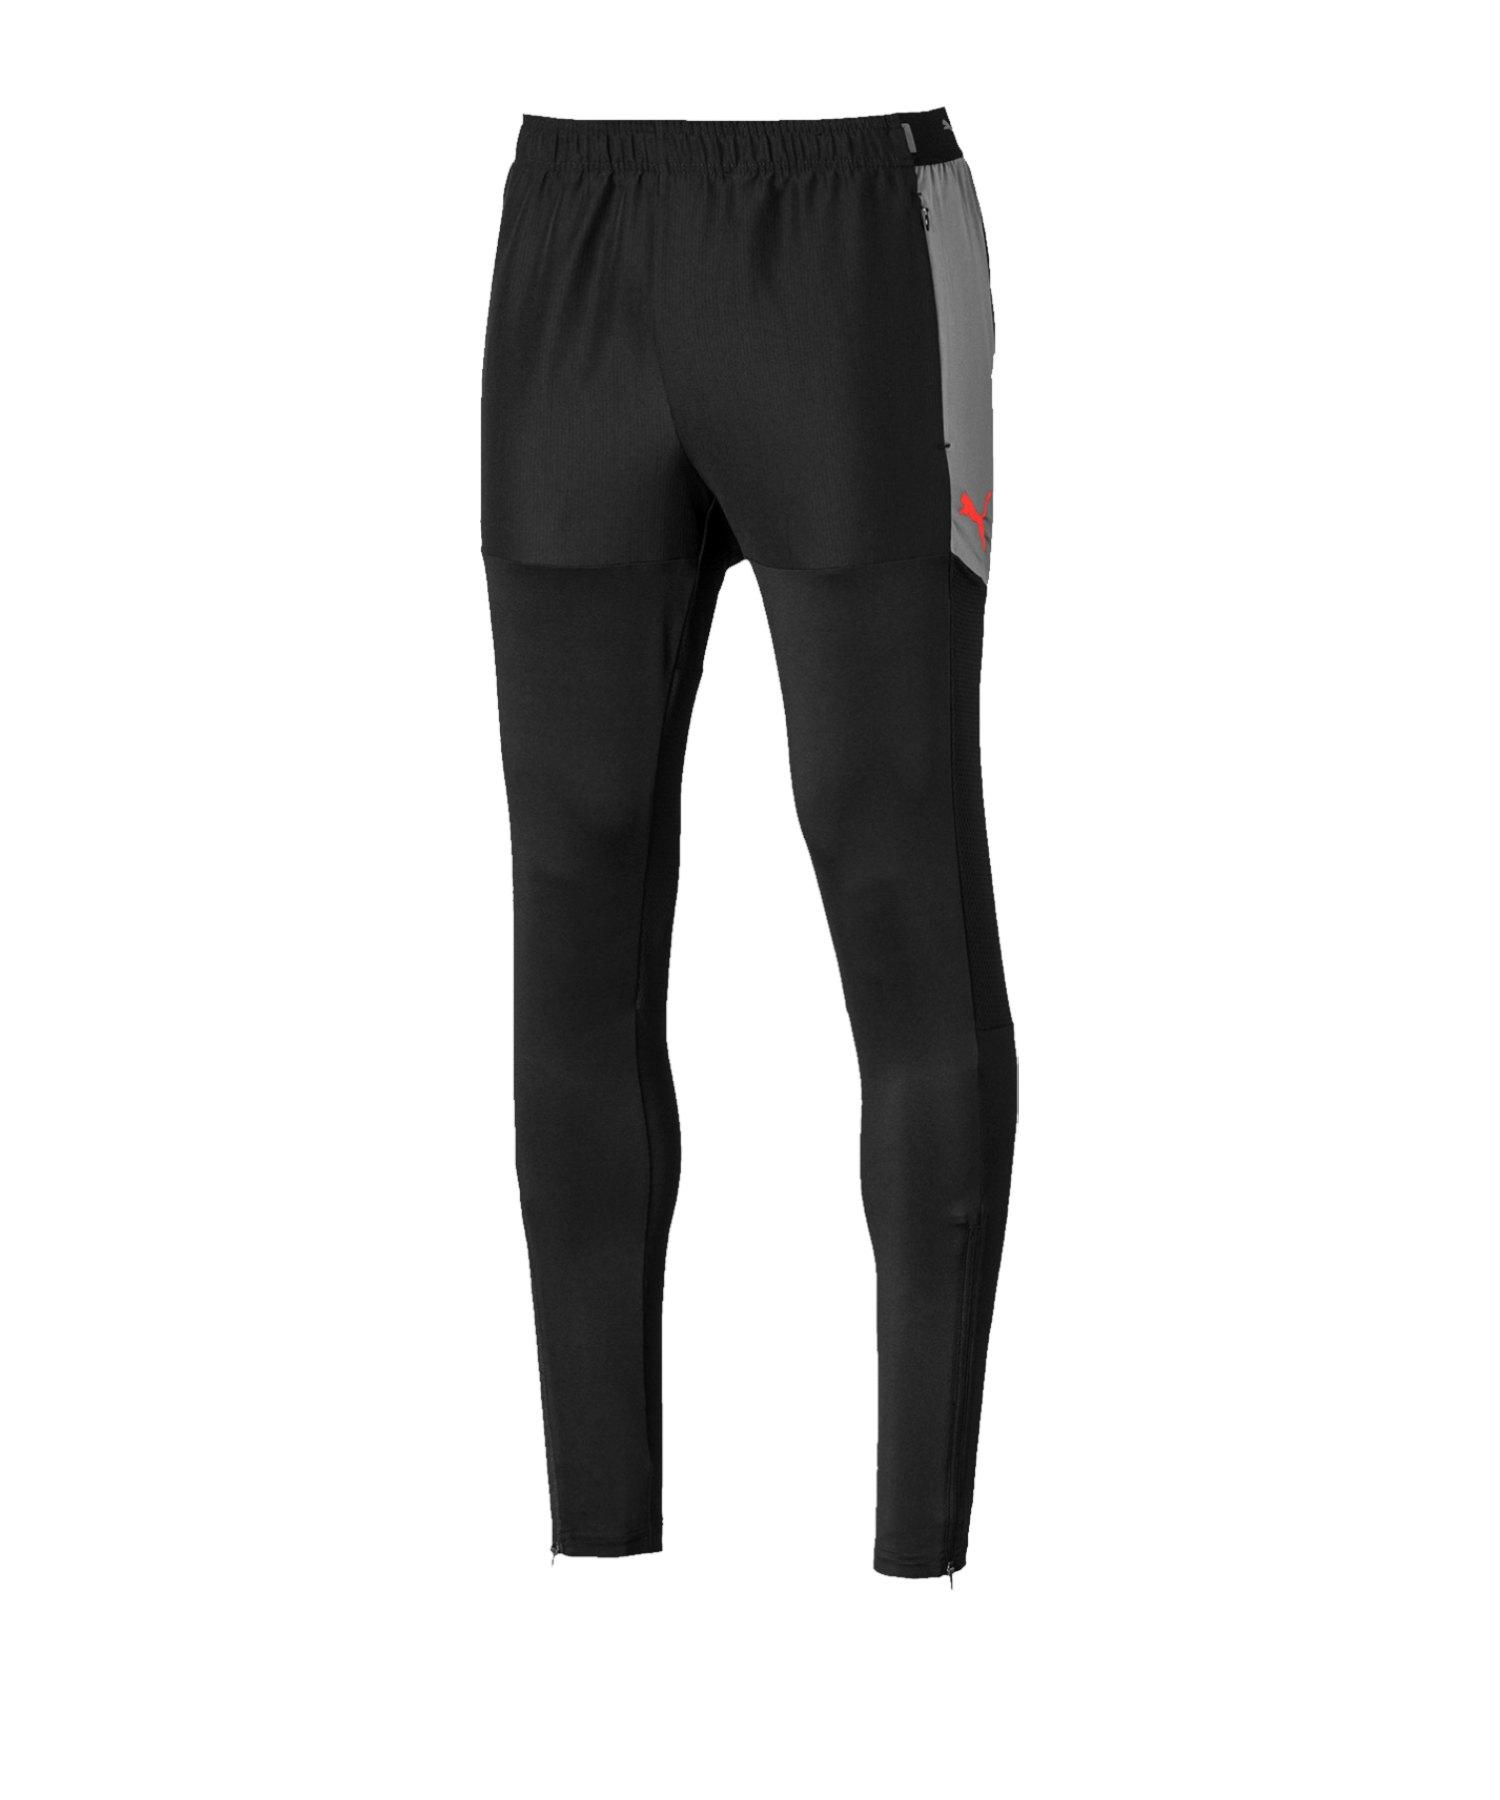 PUMA ftblNXT Pro Pant Jogginghose Schwarz F01 - Schwarz